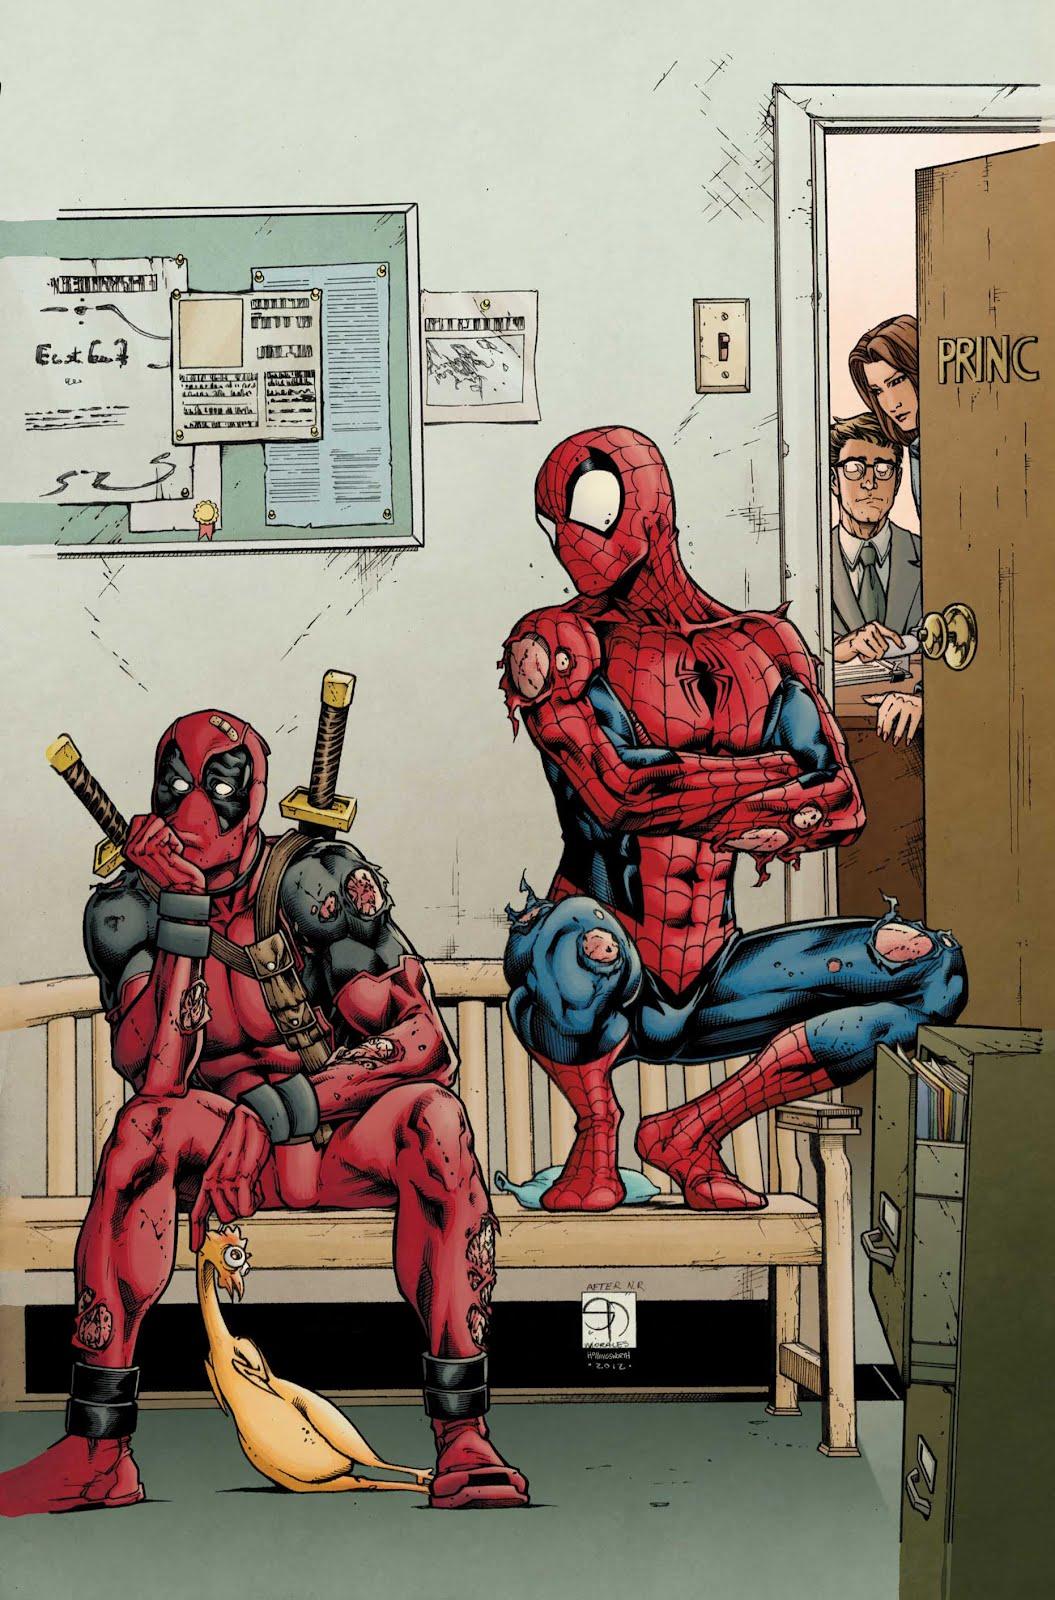 Deadpool Drawings Spider Superhero And Man